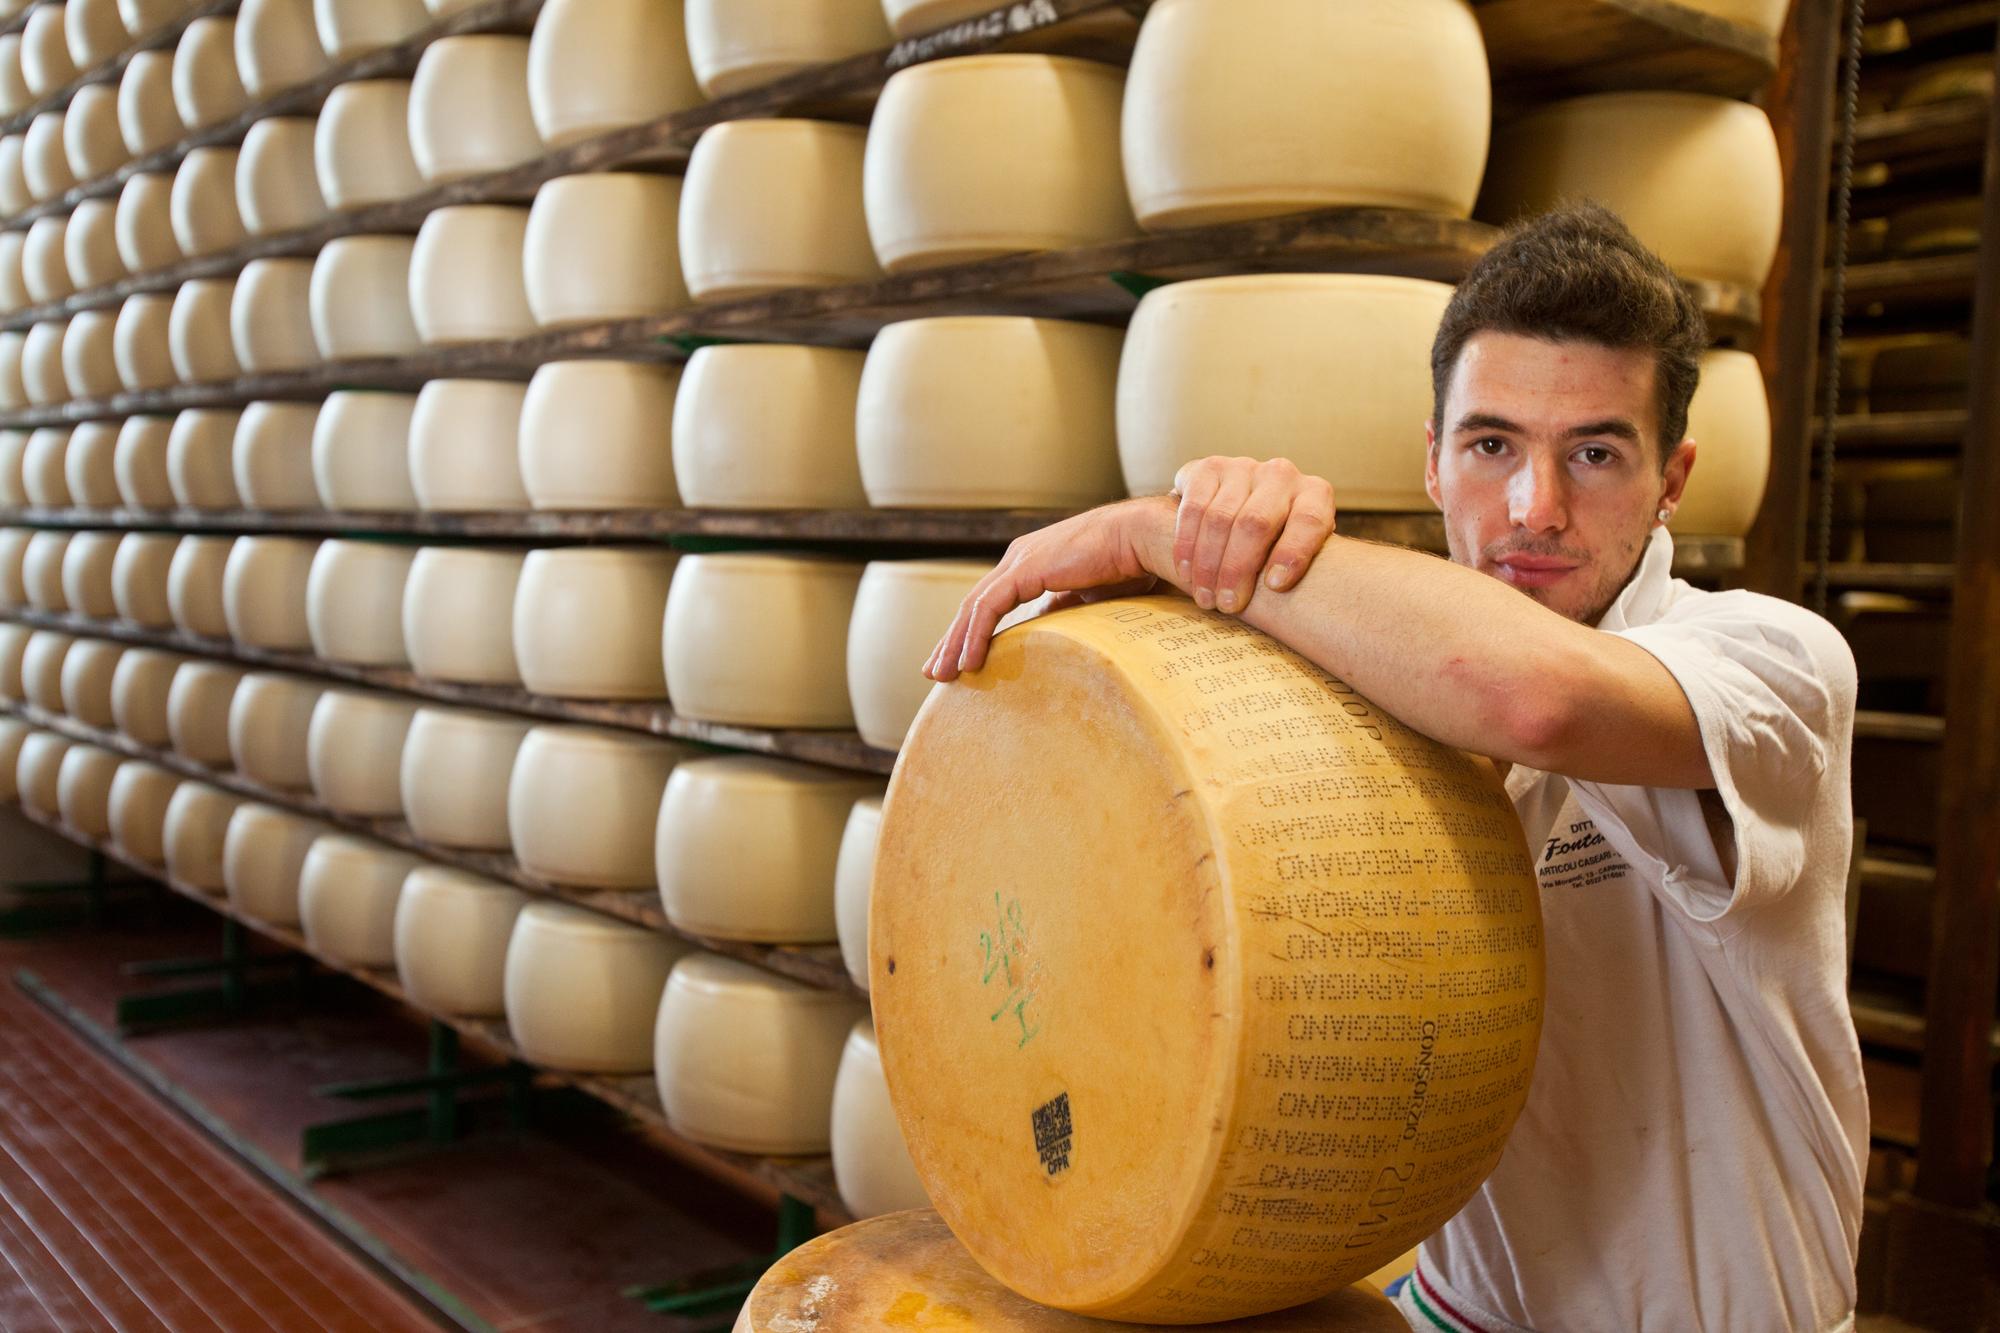 Parmesan cheese producer, Reggio, Italy